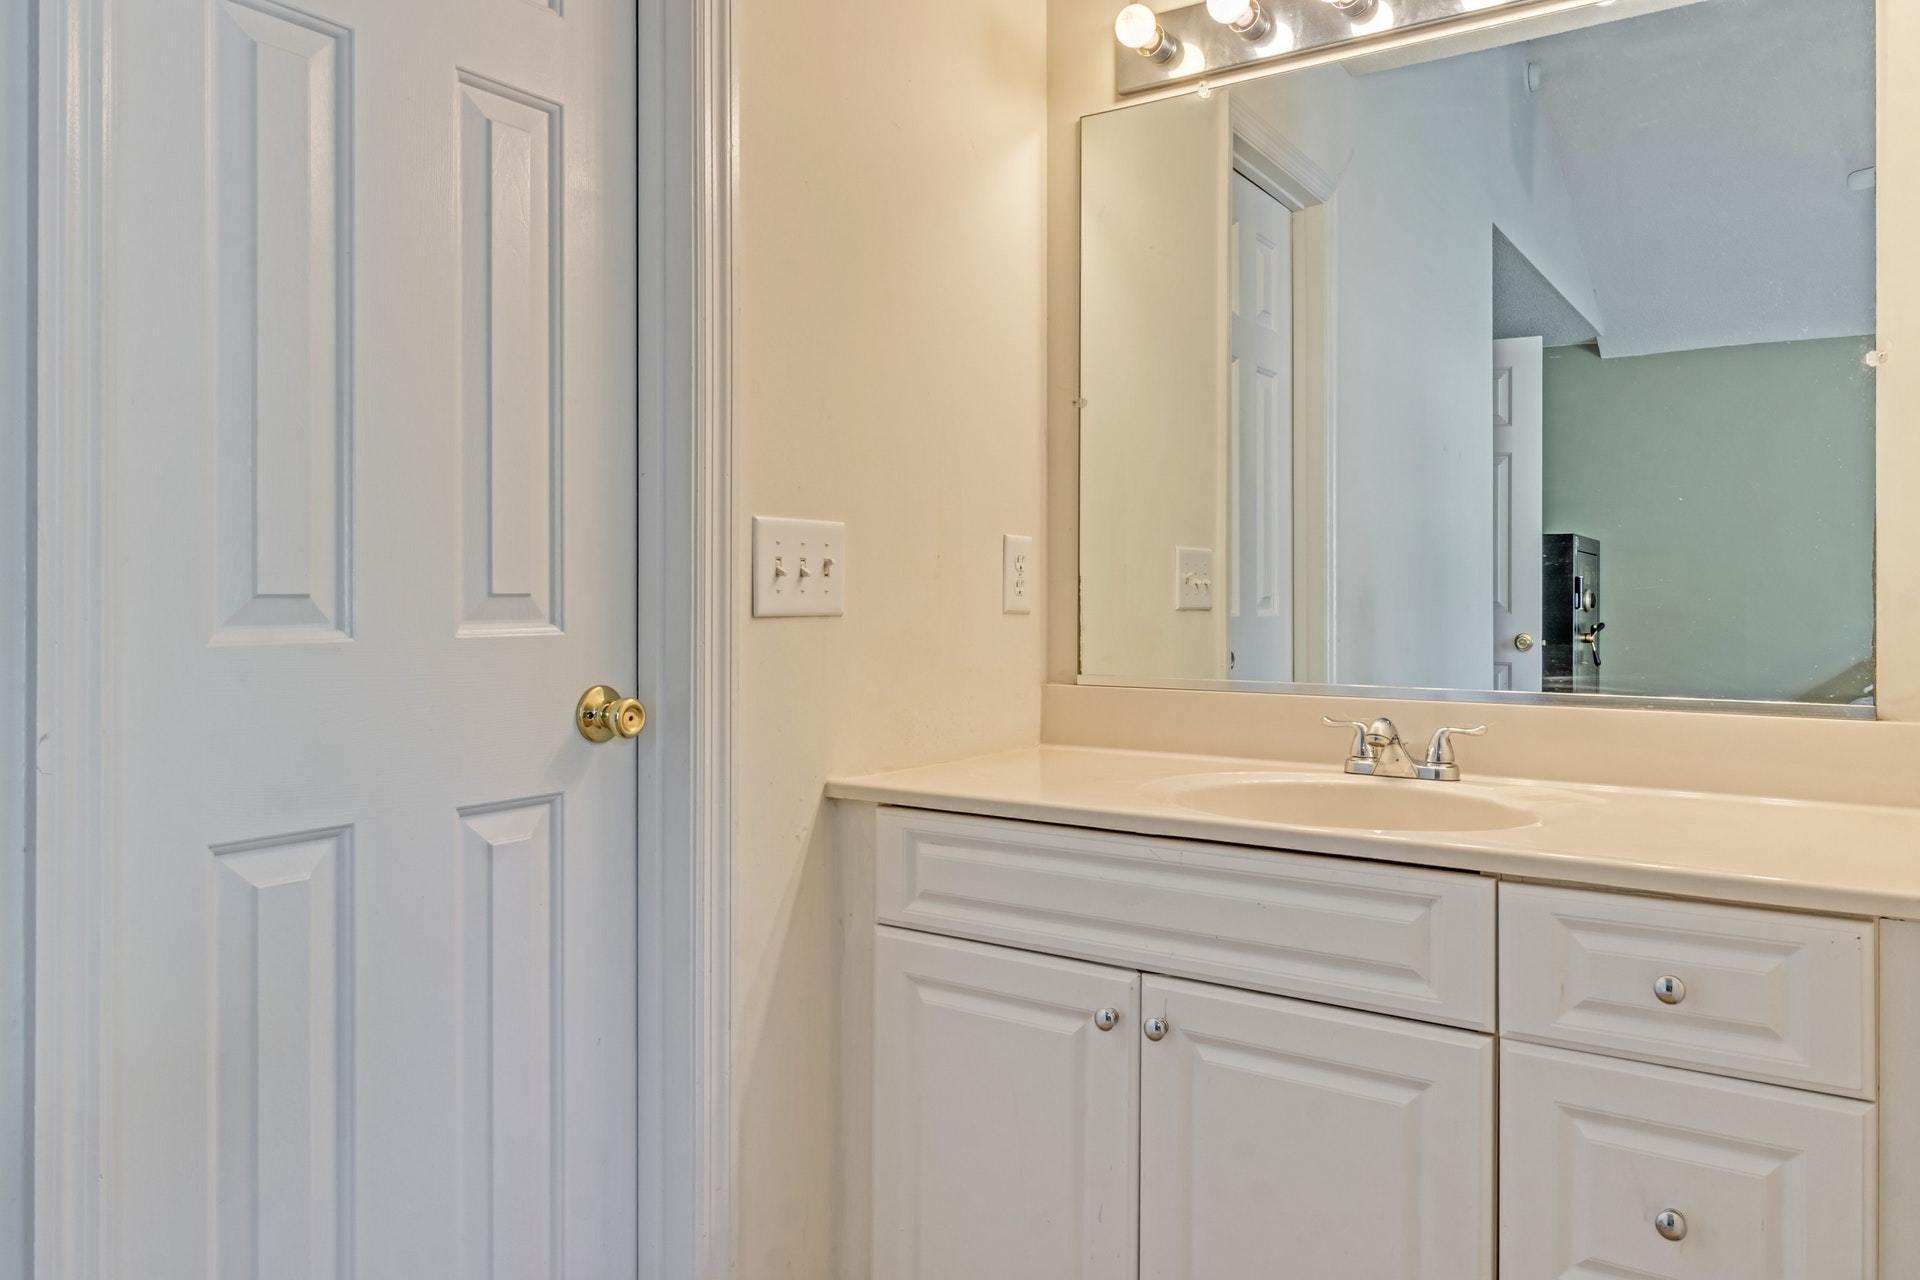 Double Oaks Homes For Sale - 2402 Double Oak, Charleston, SC - 15